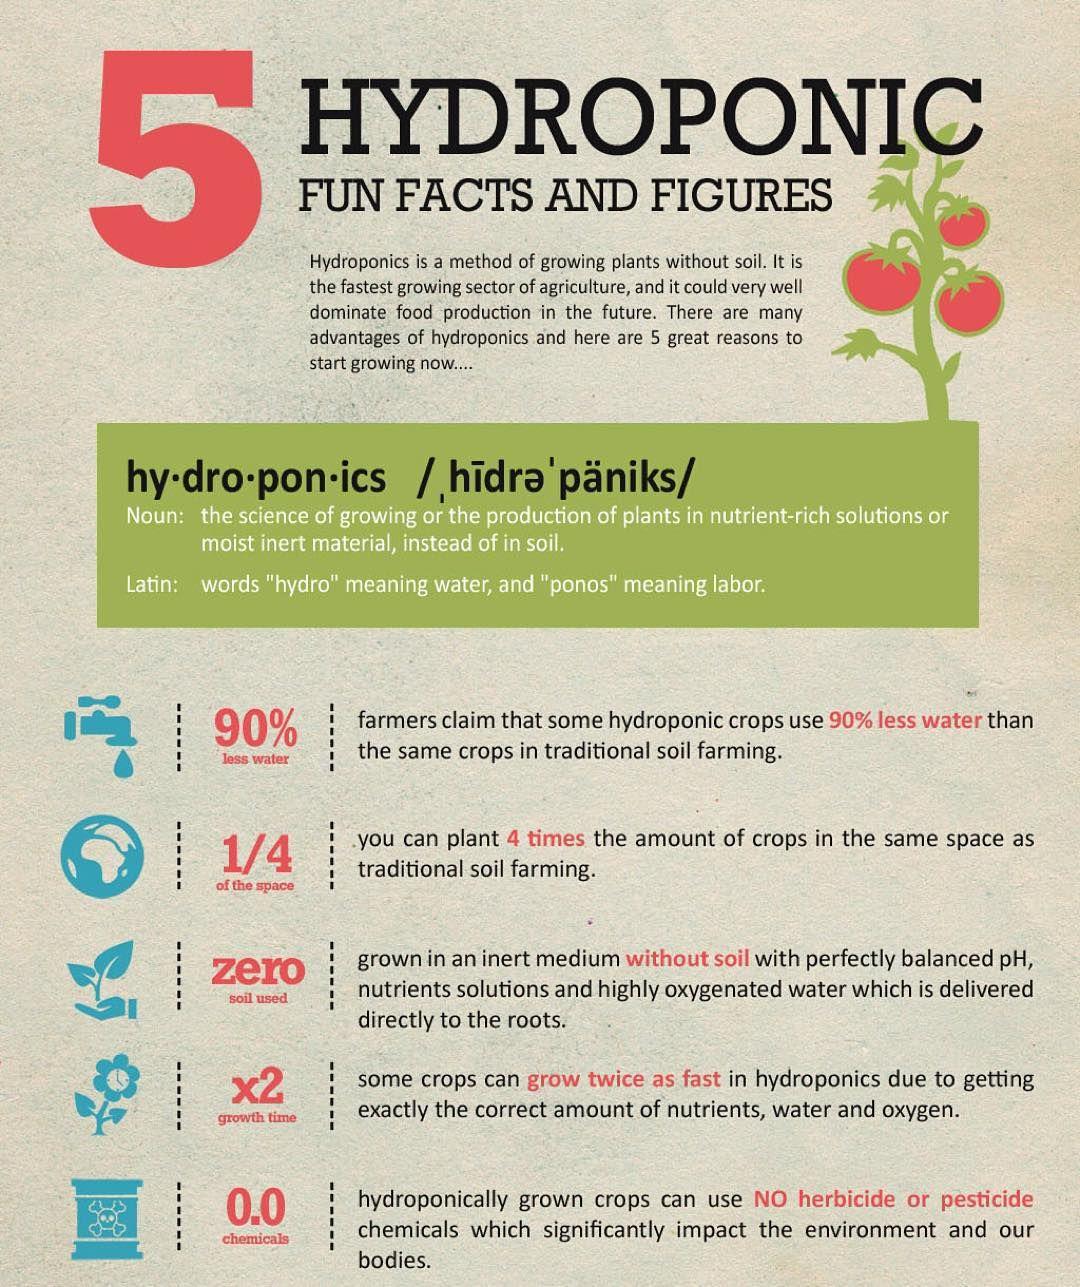 5 fun facts on hydroponic agriculture  nabuproduce  spinach  kale  arugula   microgreens  nongmo  organic  leafygreens  babygreens  nom   urbanagriculture ... 556d53e1c2fe